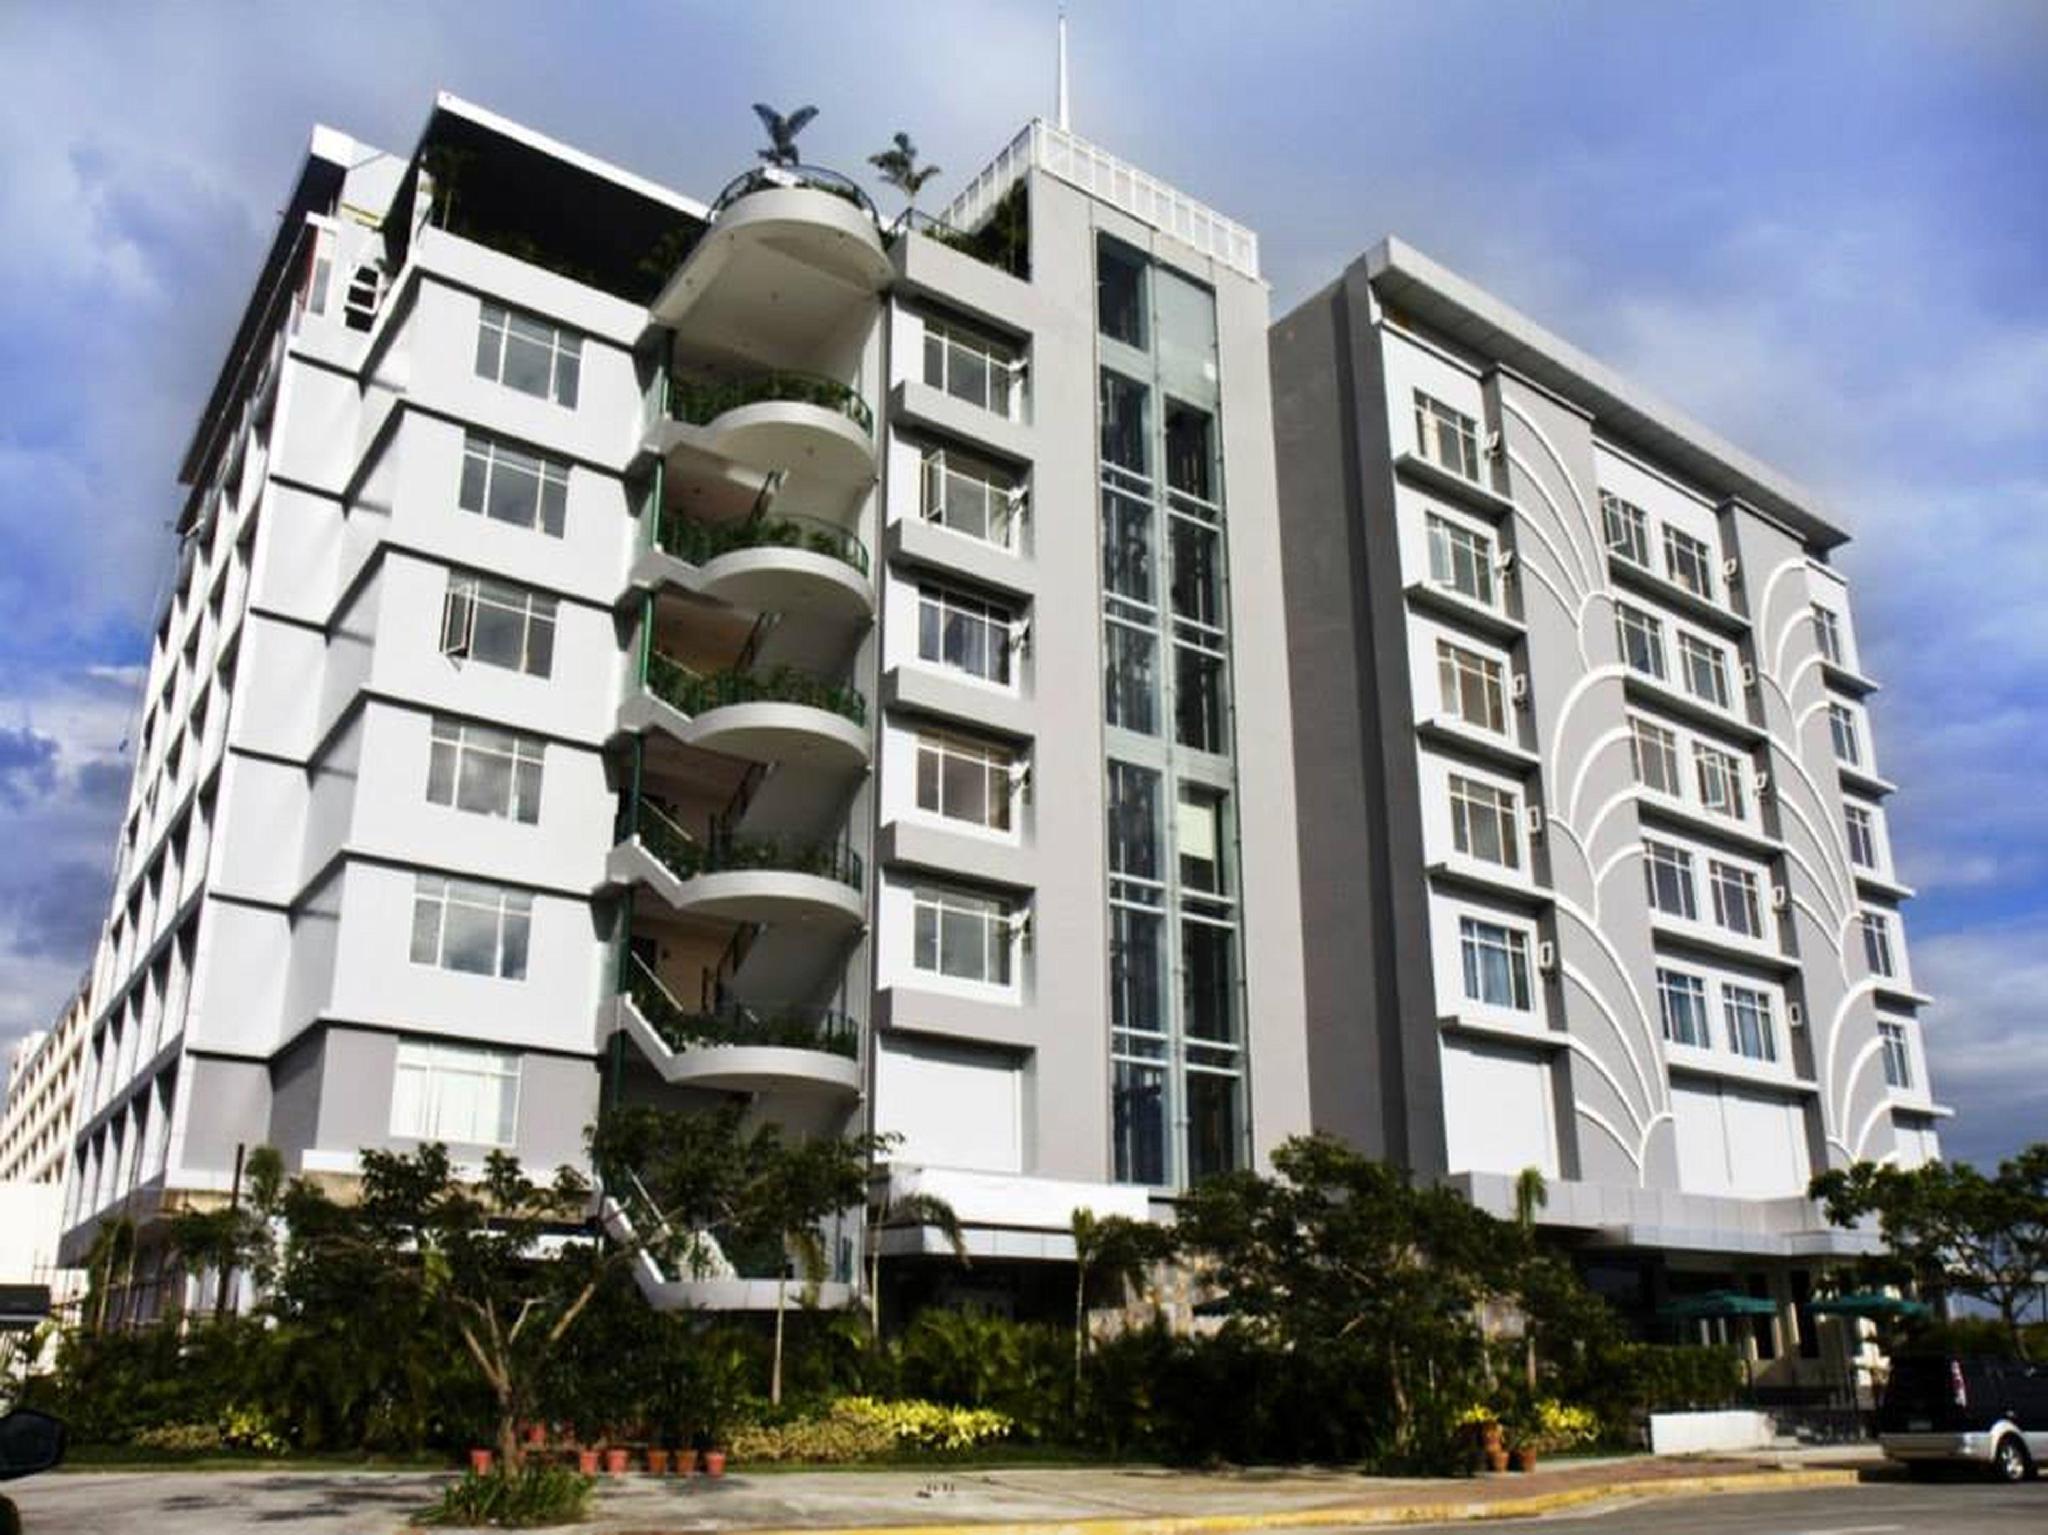 paseo premiere hotel laguna from 48 save on agoda. Black Bedroom Furniture Sets. Home Design Ideas